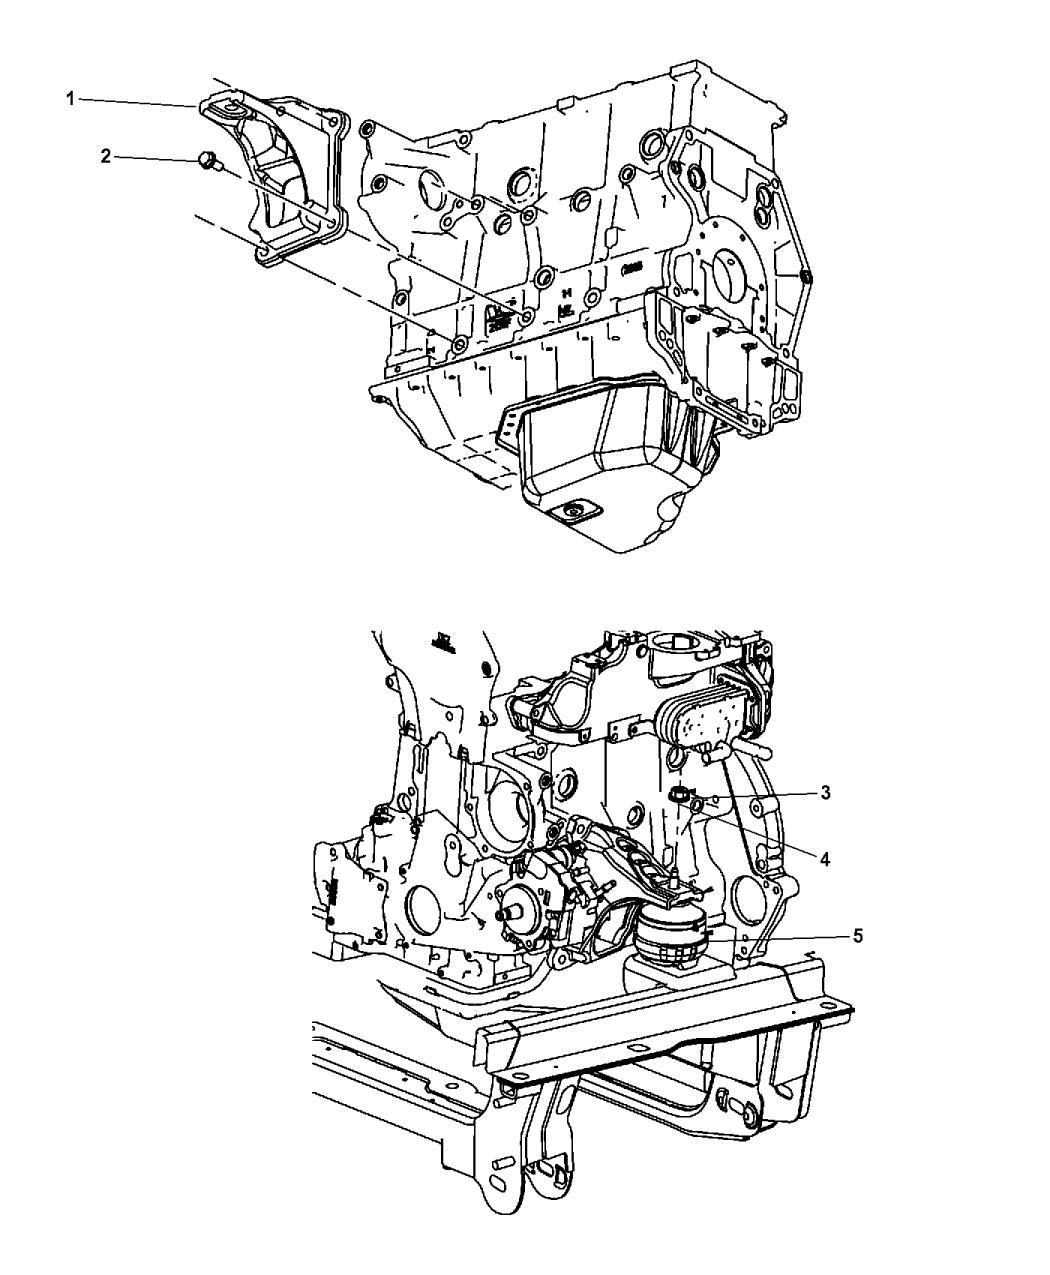 2006 Dodge Nitro Engine Diagram Wiring Library 2008 Mounting Thumbnail 4